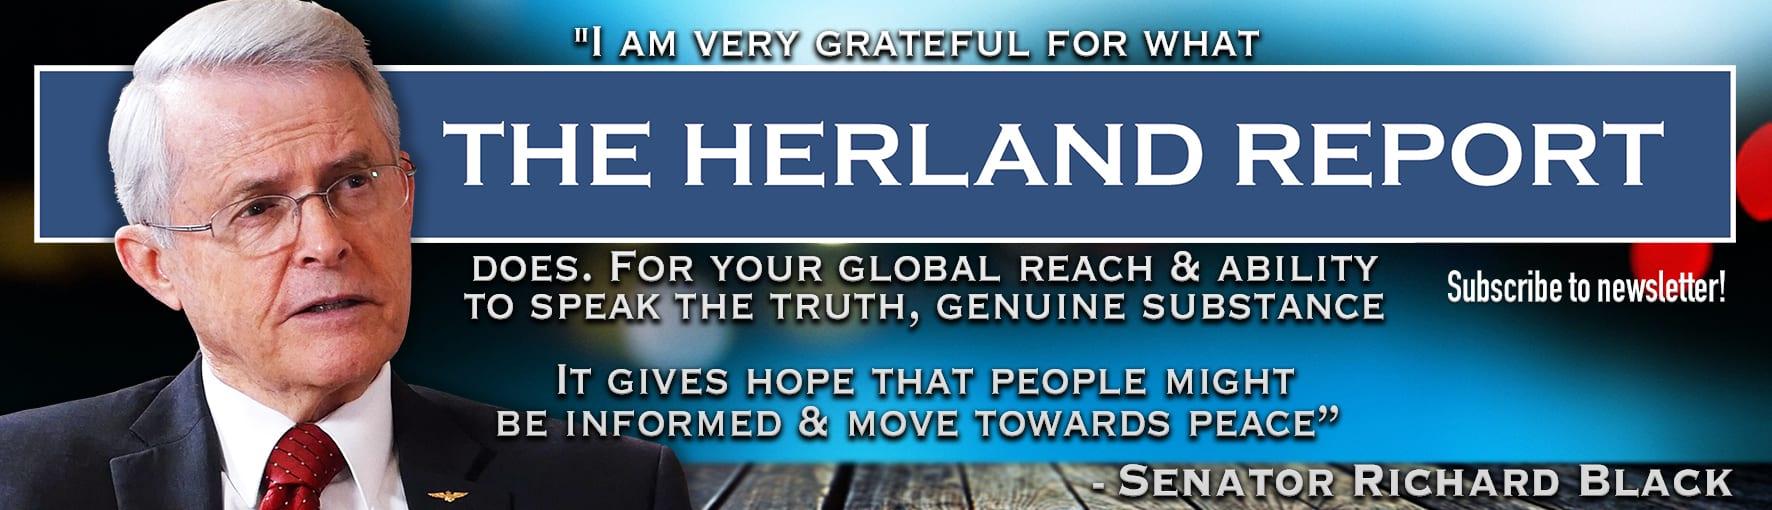 Bill Gates vaccine dictatorship plan, Messianic complex: Herland Report banner